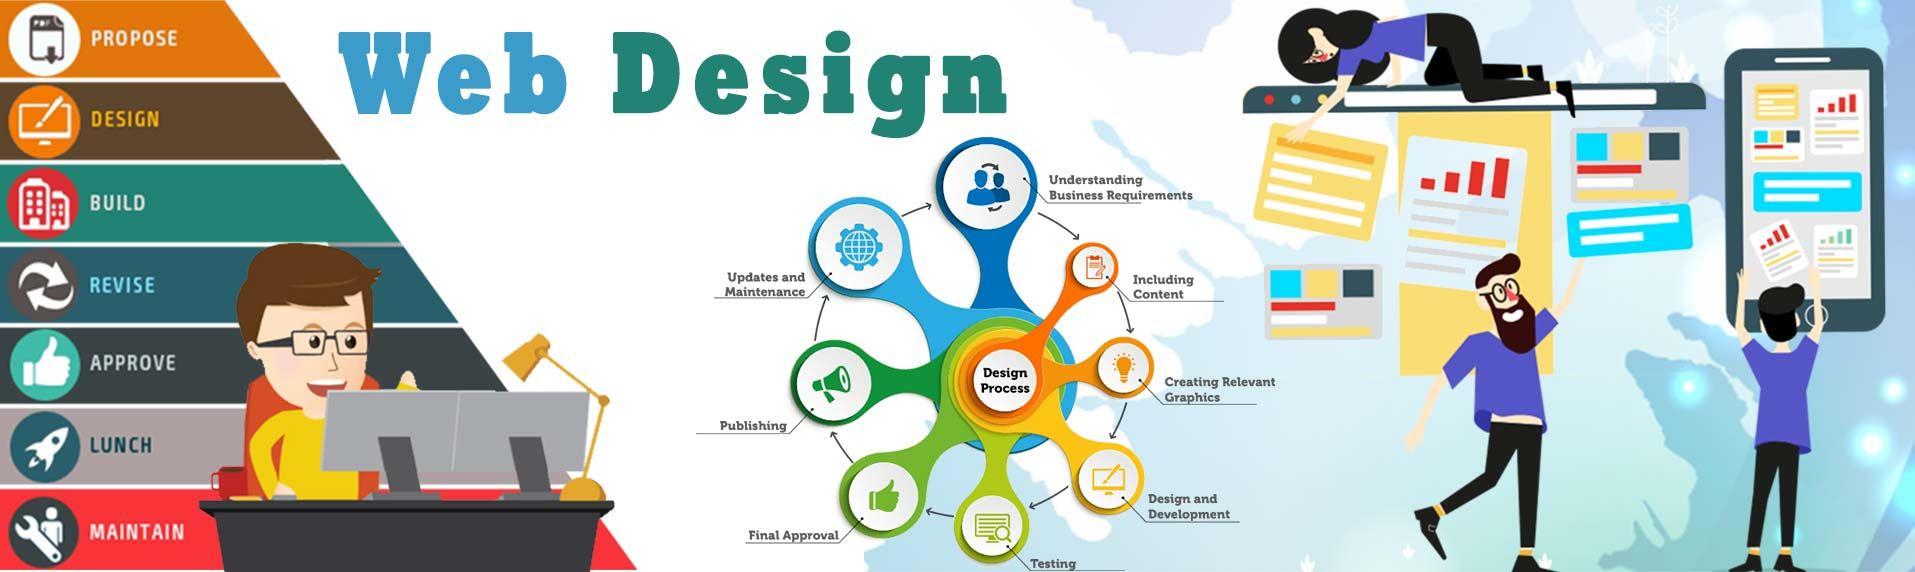 Top Web Designing Service In Srinagar Web Design Web Design Services Top Digital Marketing Companies